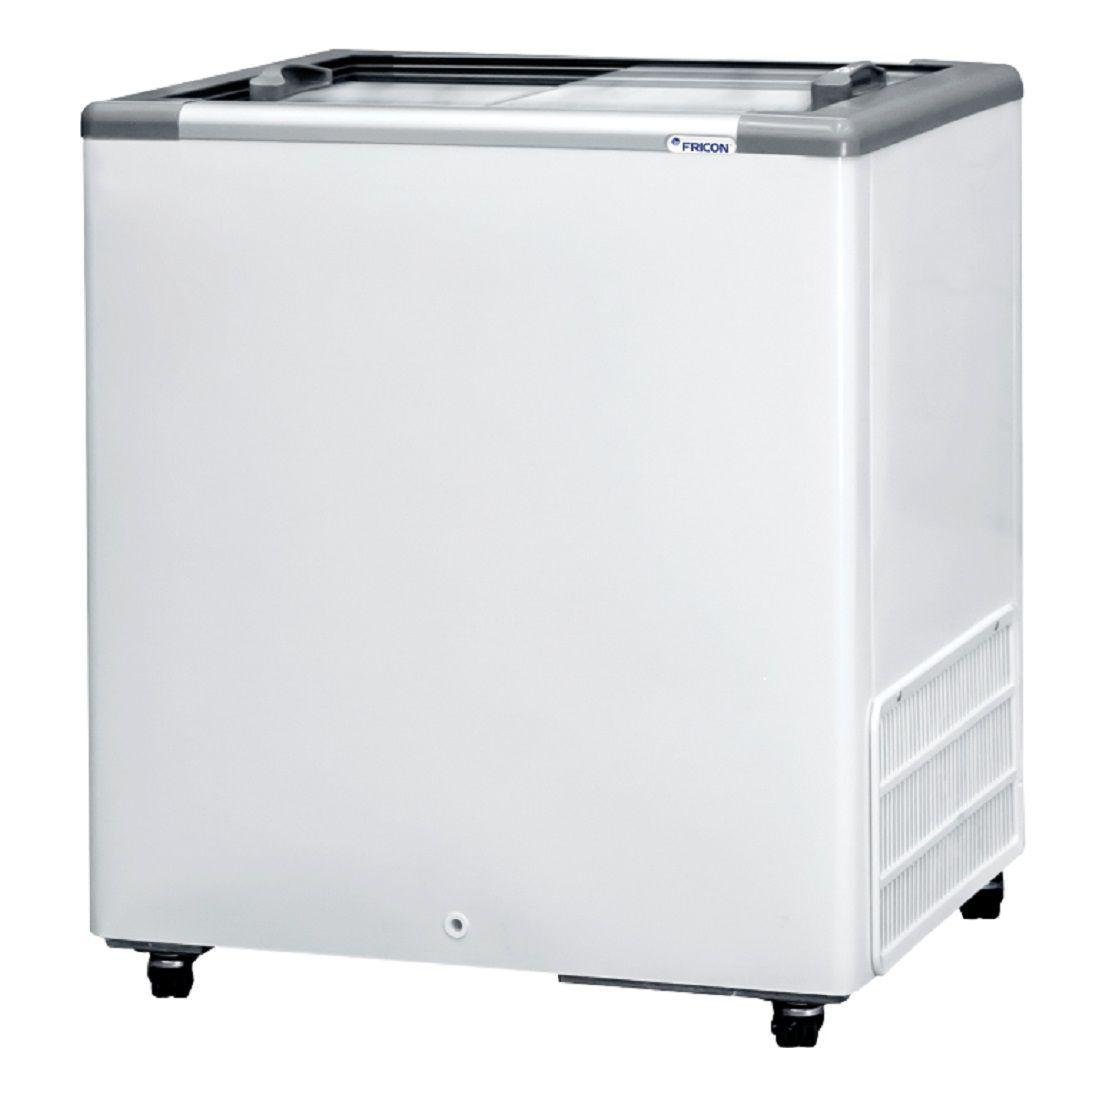 Freezer Expositor Horizontal 216 Litros Tampa de Vidro HCEB-216 127v Fricon